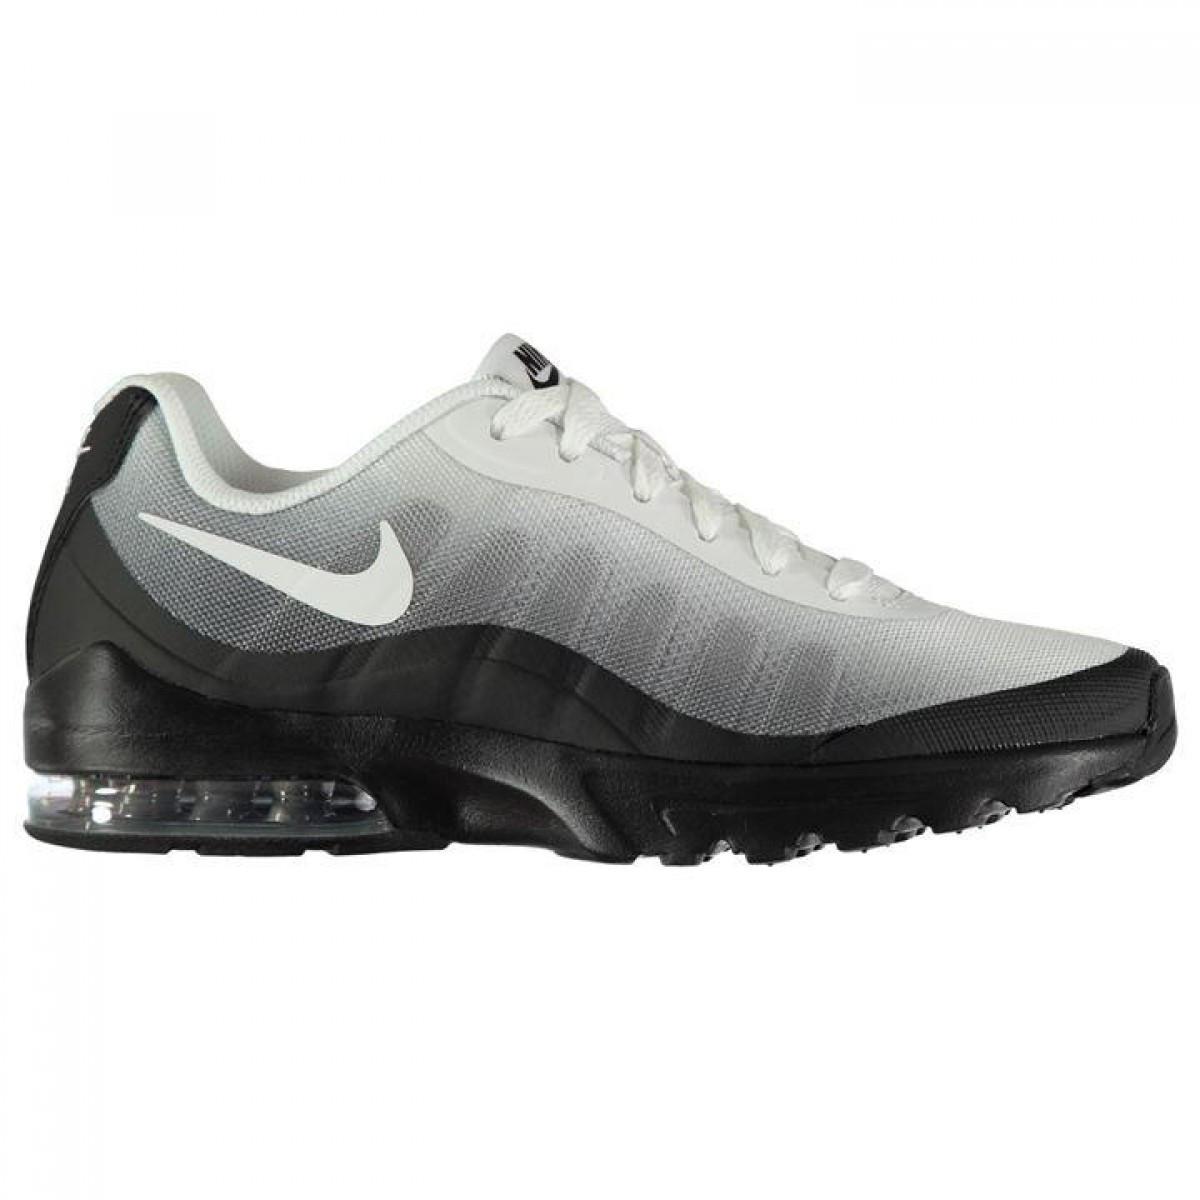 Кроссовки Nike Air Max Invigor Print Black Wht Grey - Оригинал — в ... 9f48d30ace2